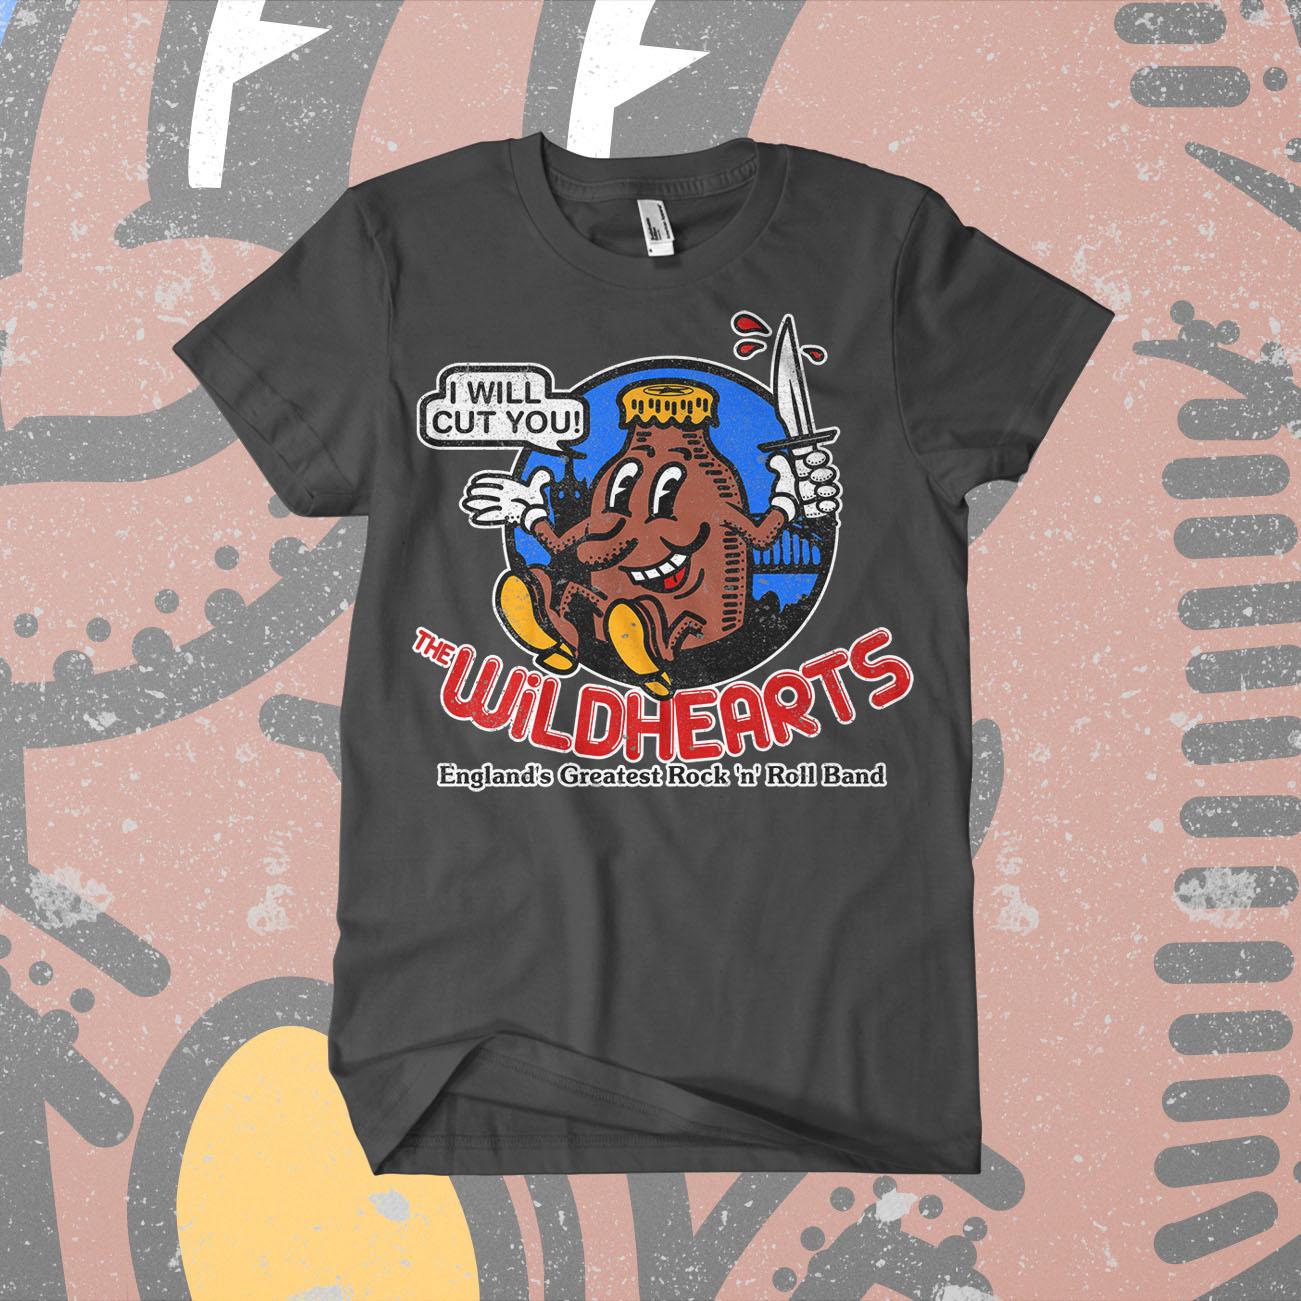 The Wildhearts - 'Howdy' T-Shirt - The Wildhearts